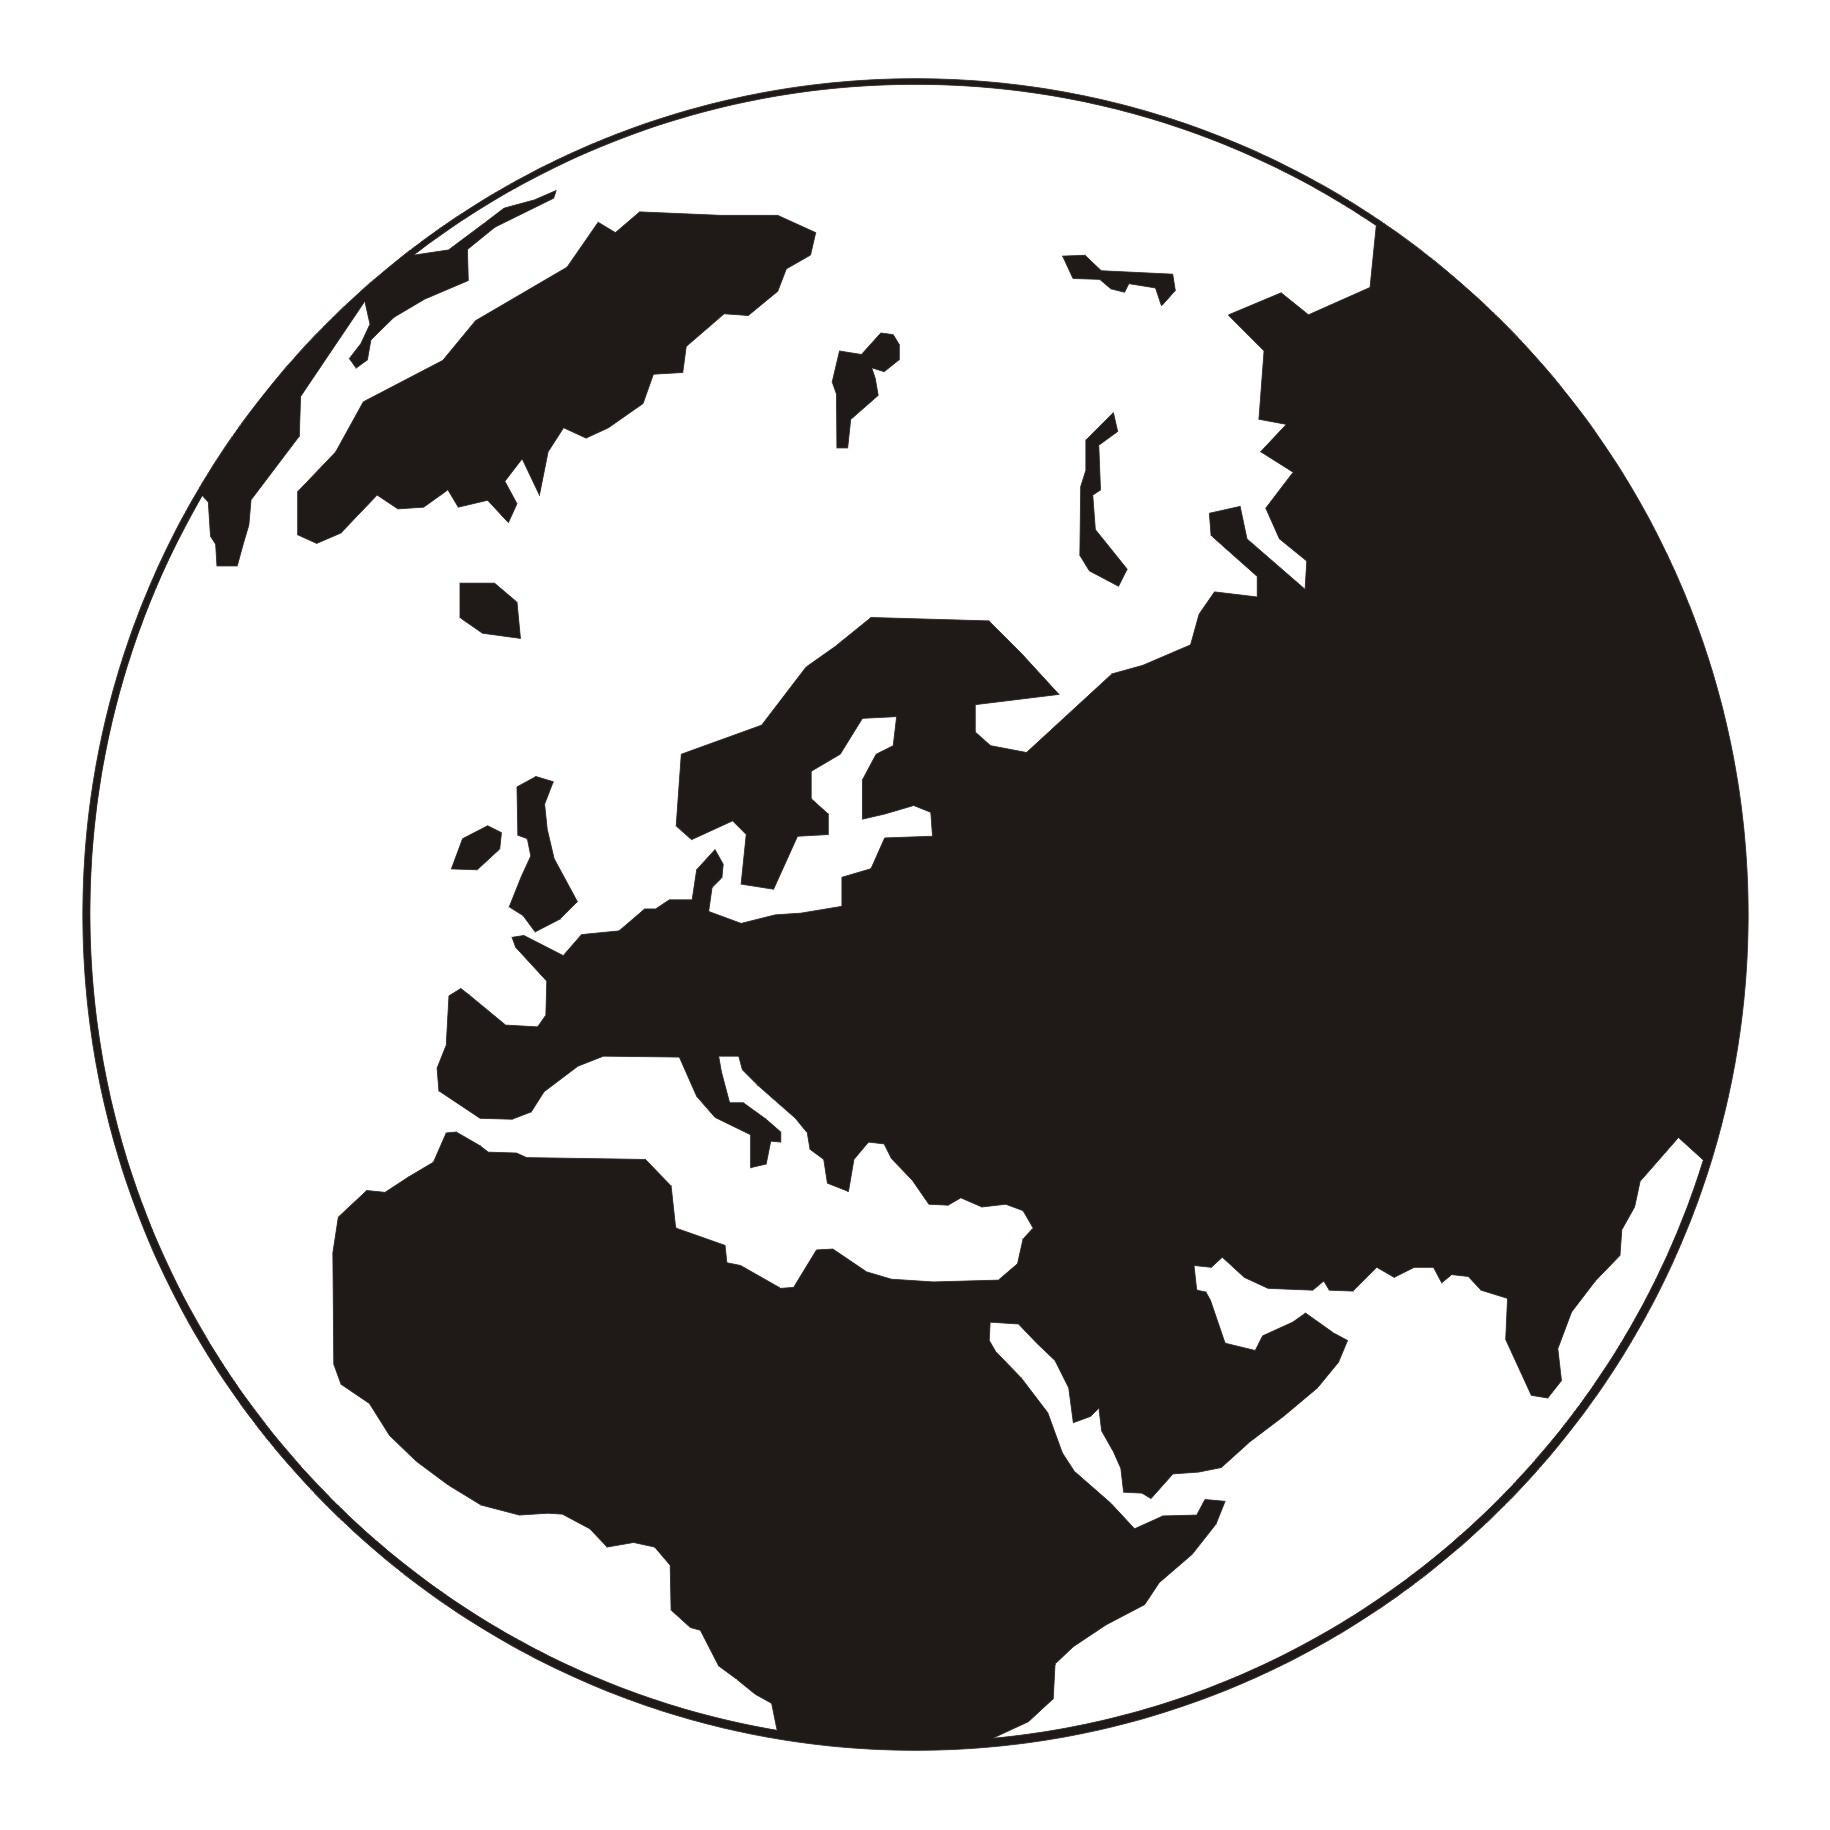 Clip art of world clipart 2